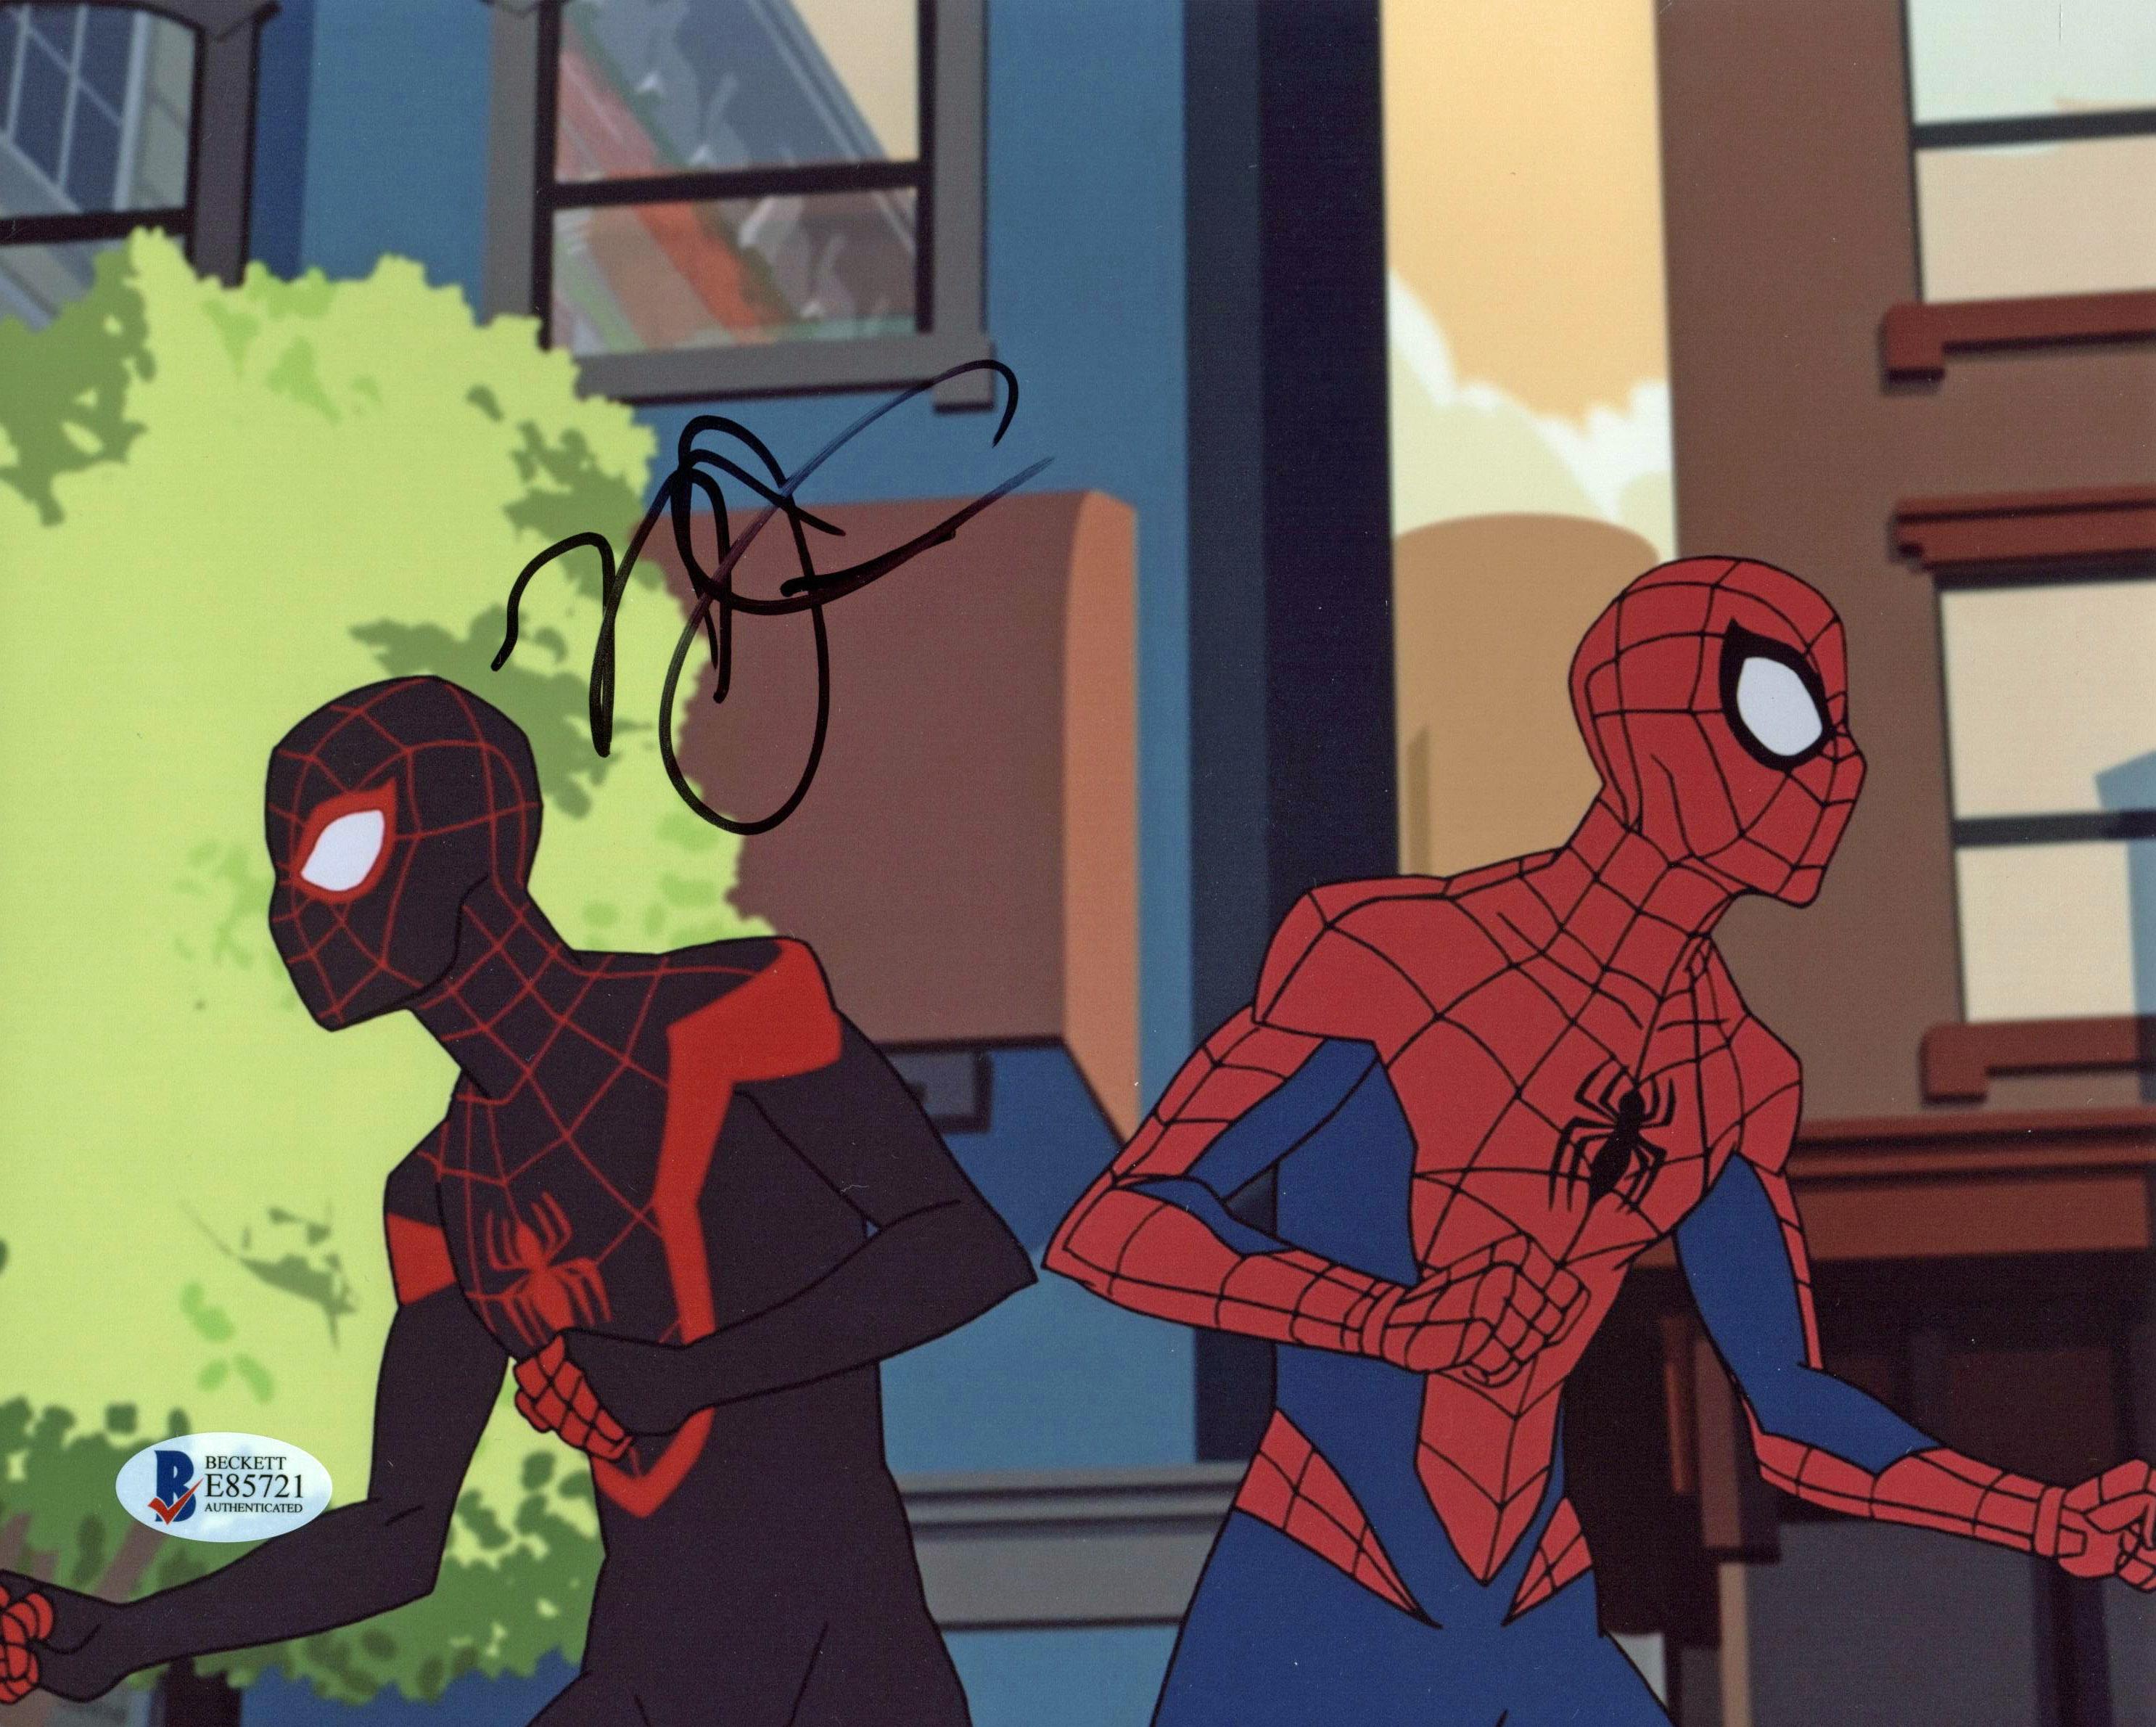 Stan Lee Autographed & Framed 8x10 Handdrawn Spiderman Sketch VIP-W704535